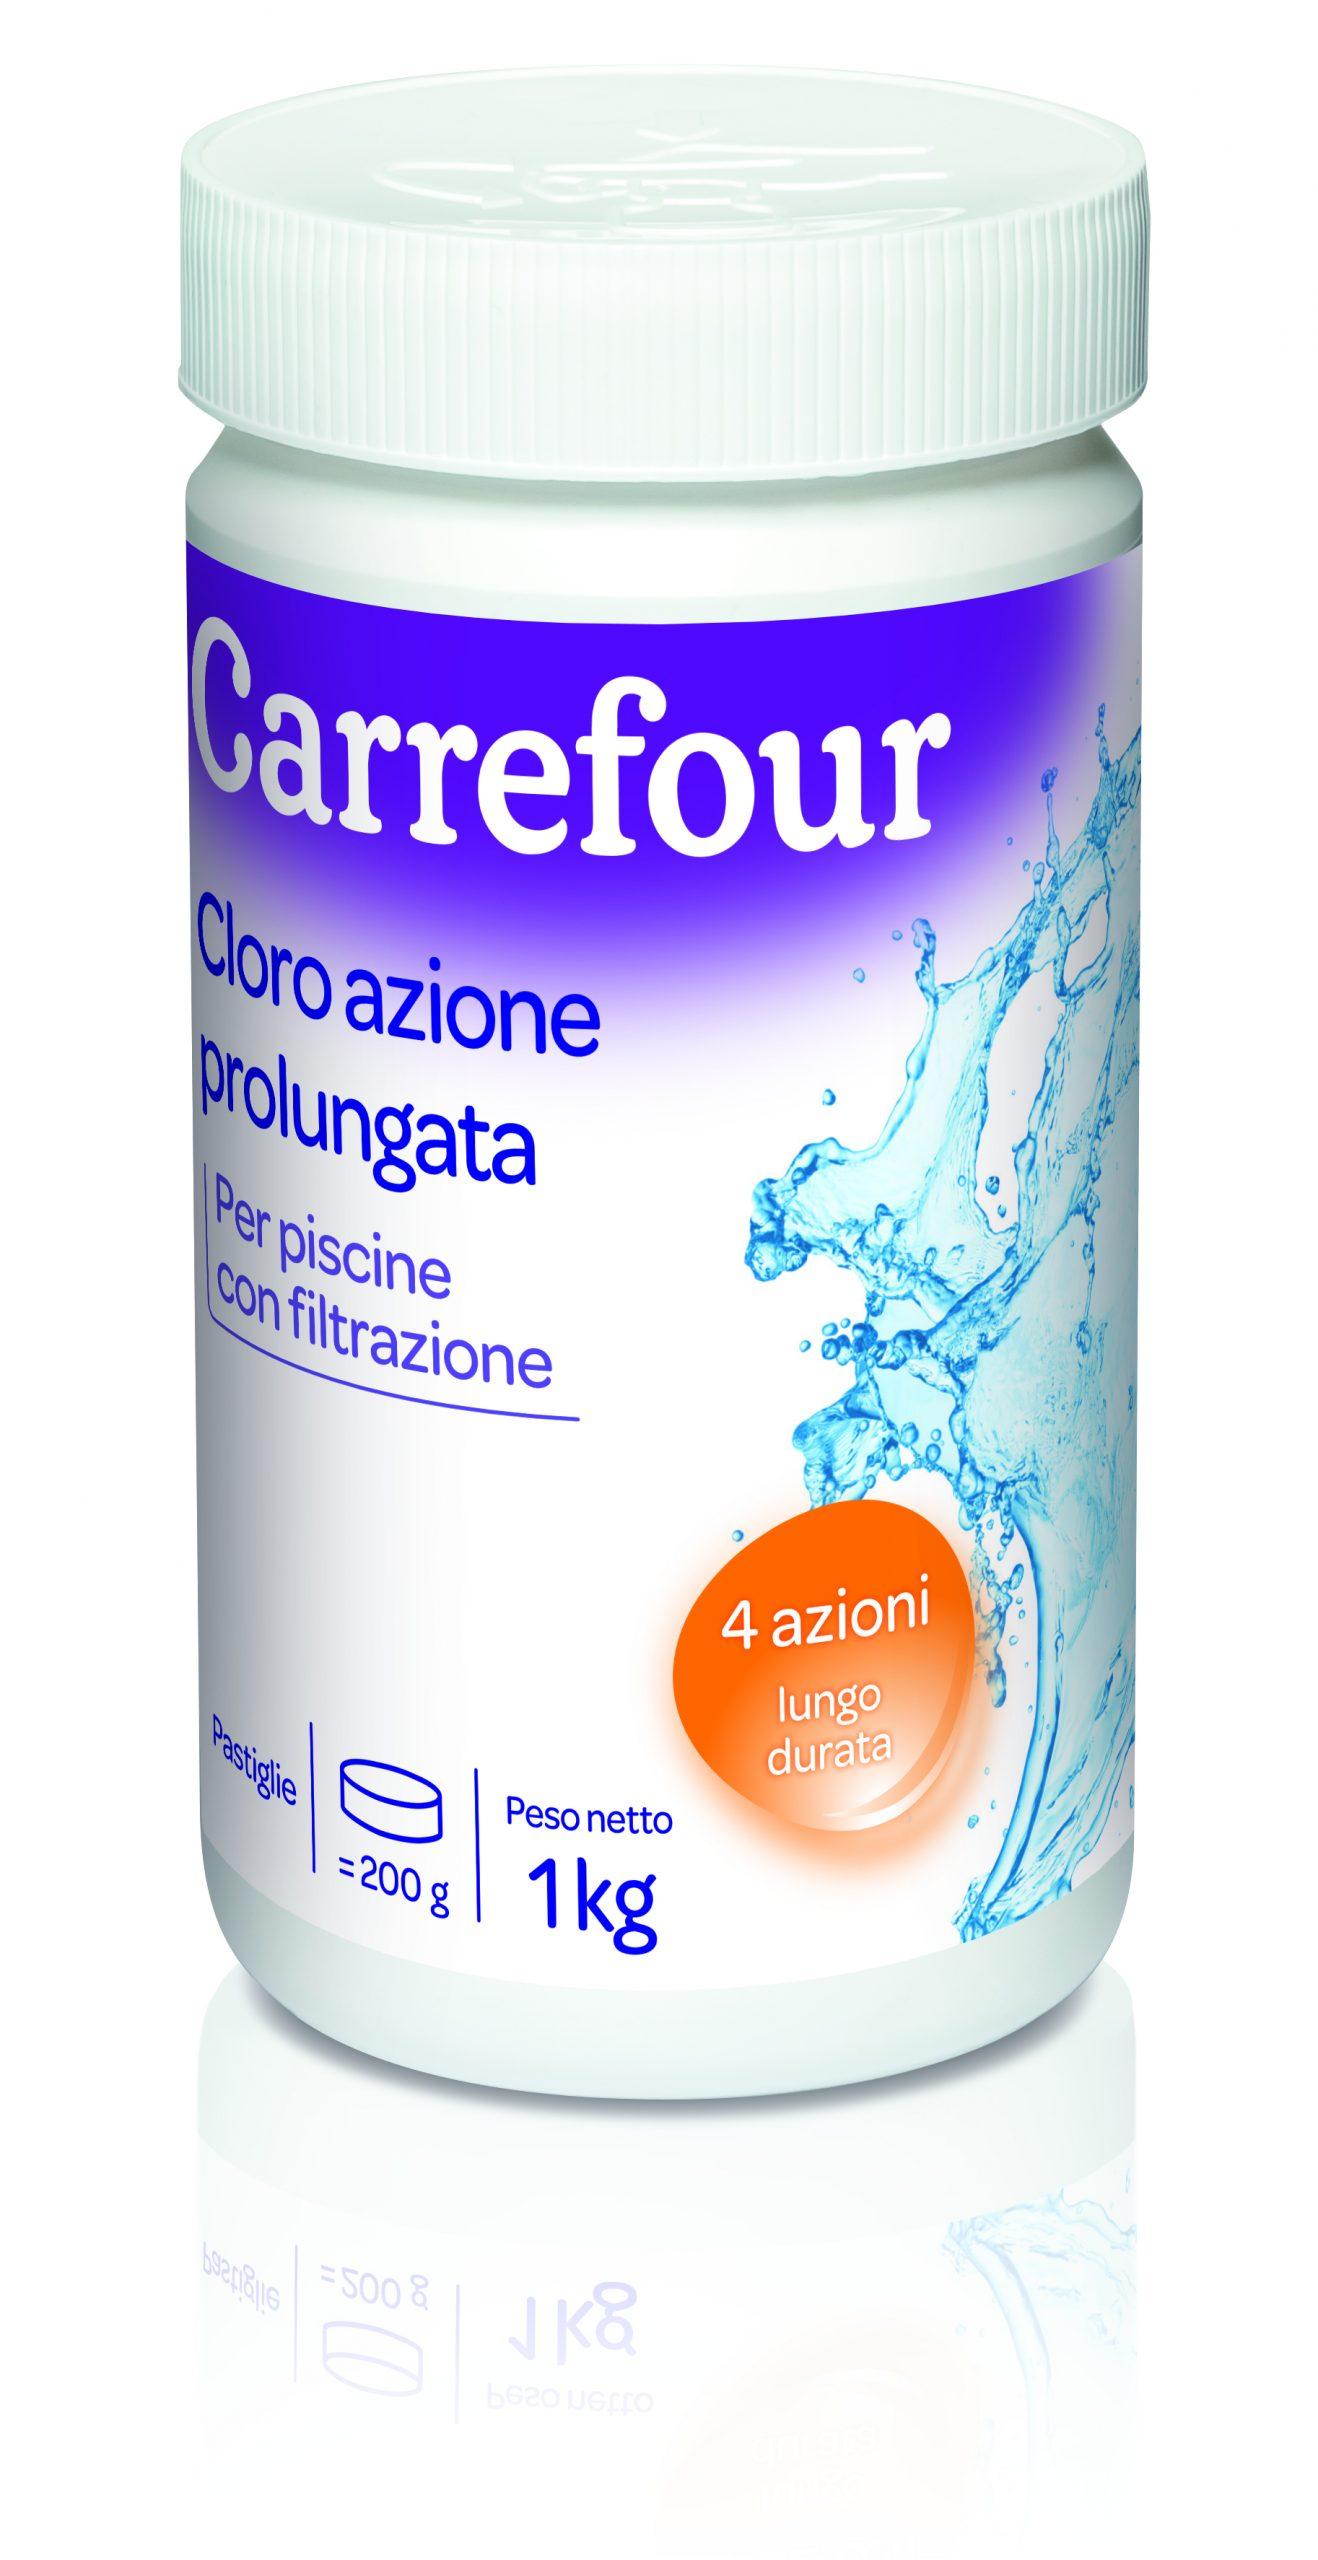 Piscine Di Cloro Carrefour